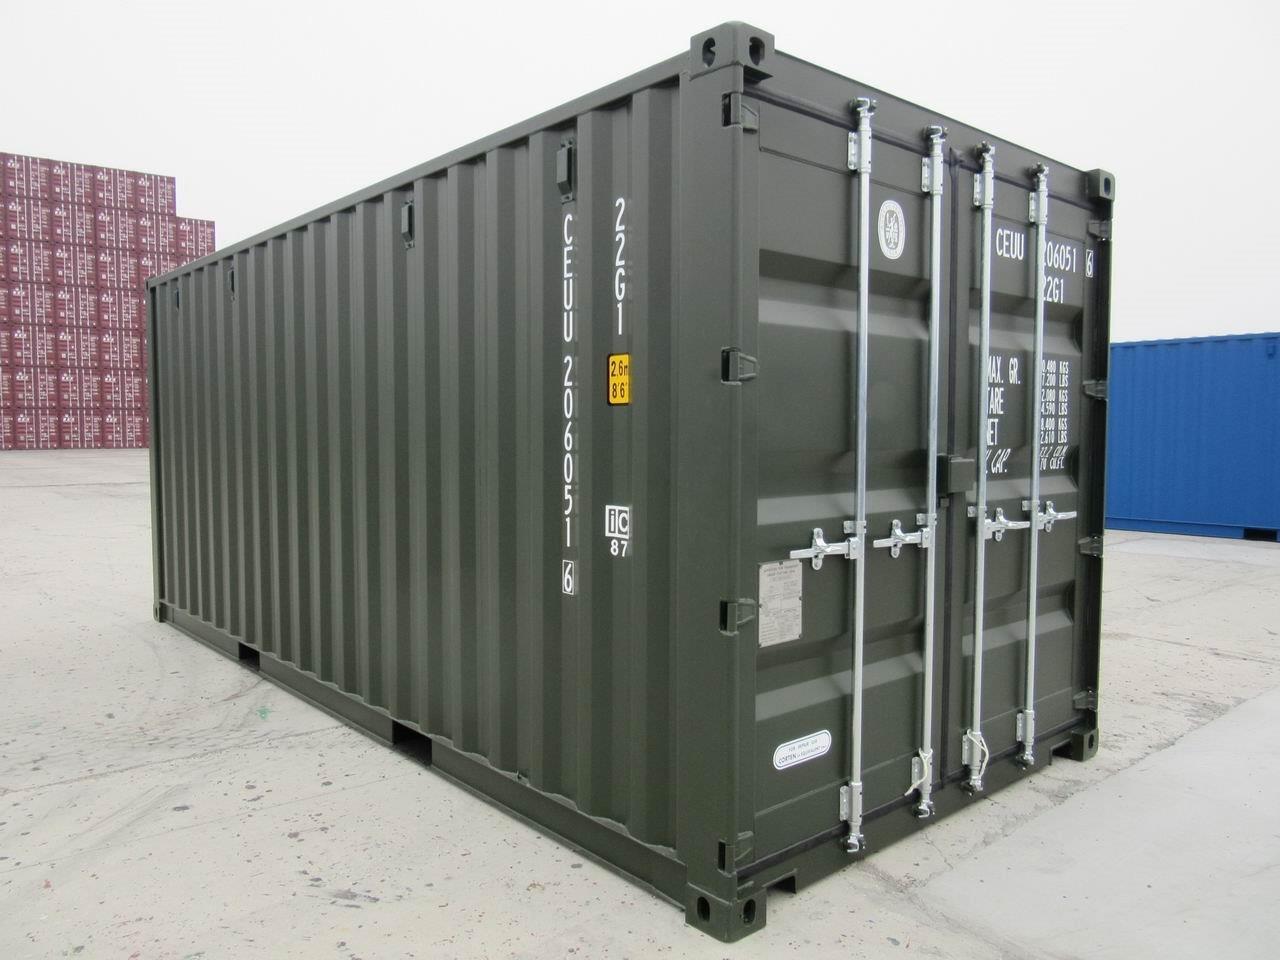 new 20ft storage container for sale only 1845 delivered. Black Bedroom Furniture Sets. Home Design Ideas